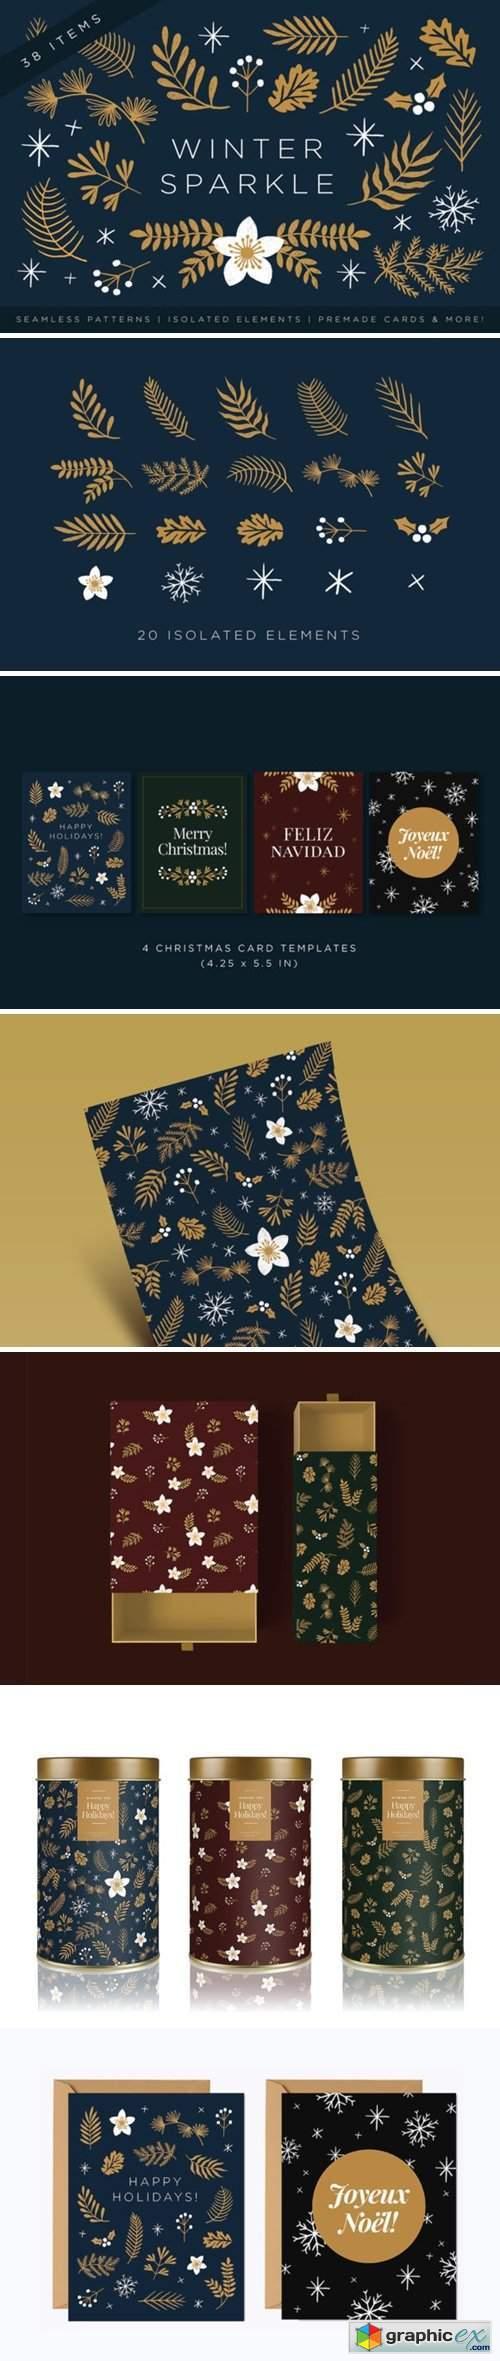 Elegant Christmas Graphic Set